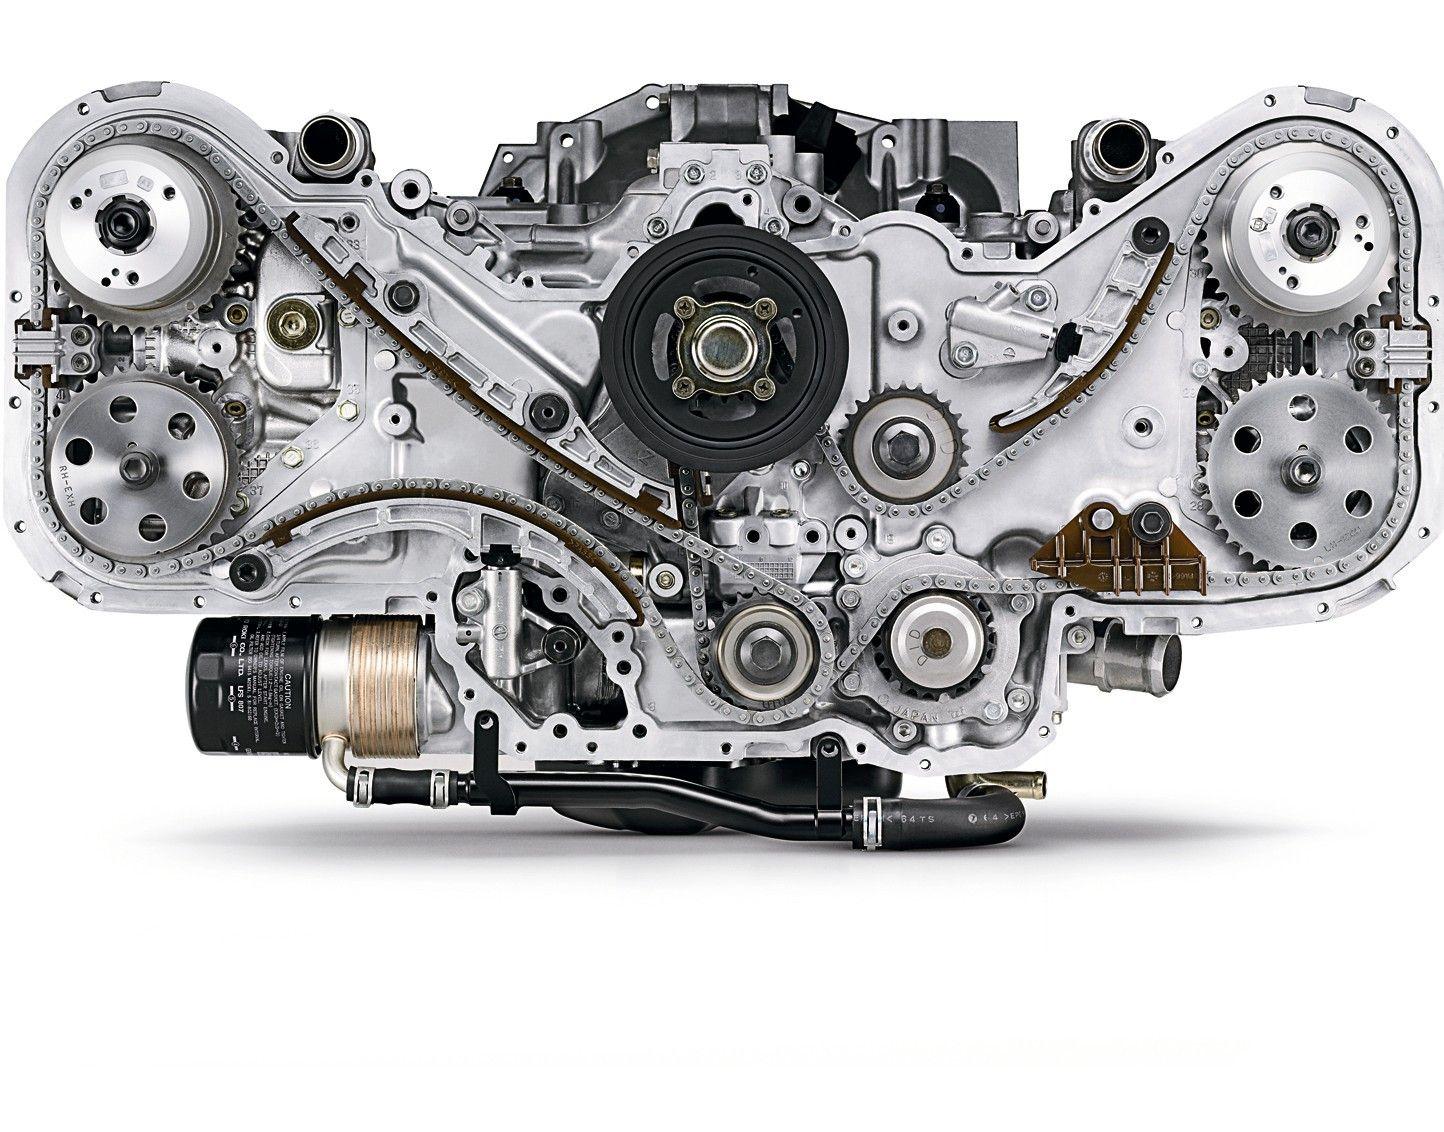 Subaru Boxer Engine Designed Porsche